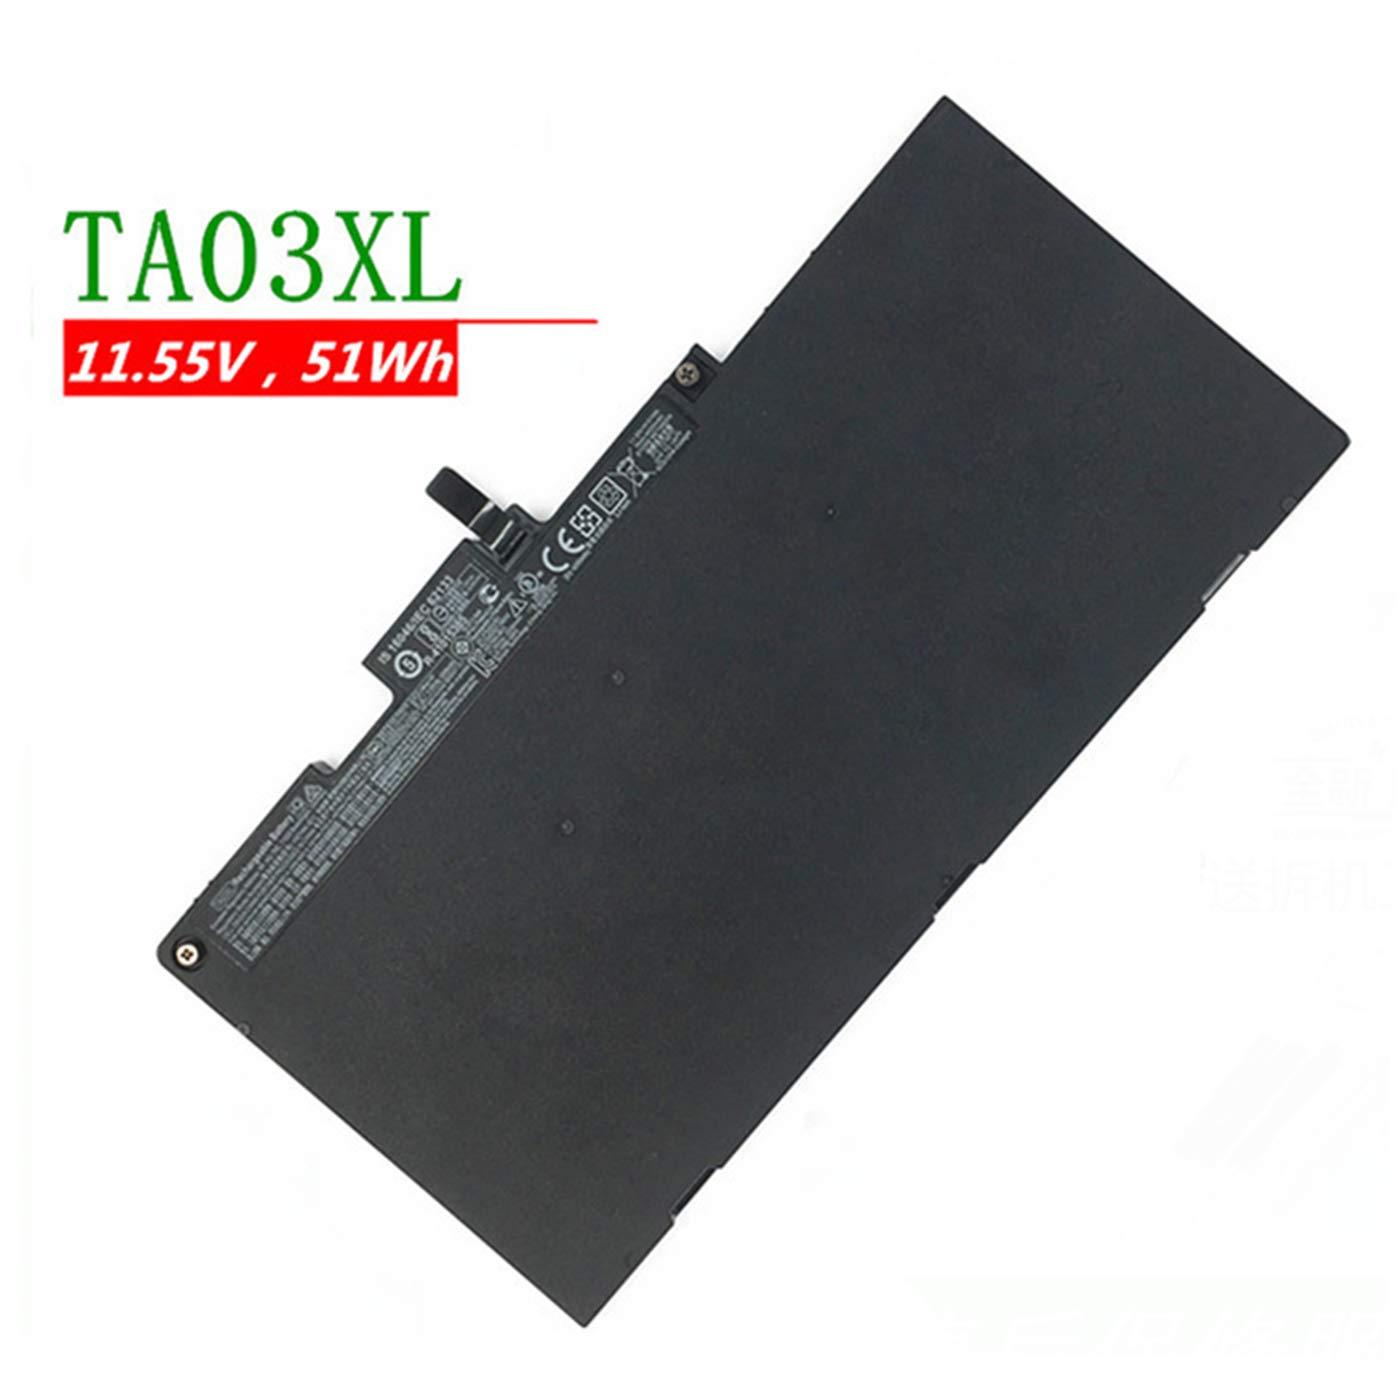 Bateria Hp TA03XL 11.55V 51Wh EliteBook 755 G4 840 G4 848 G4